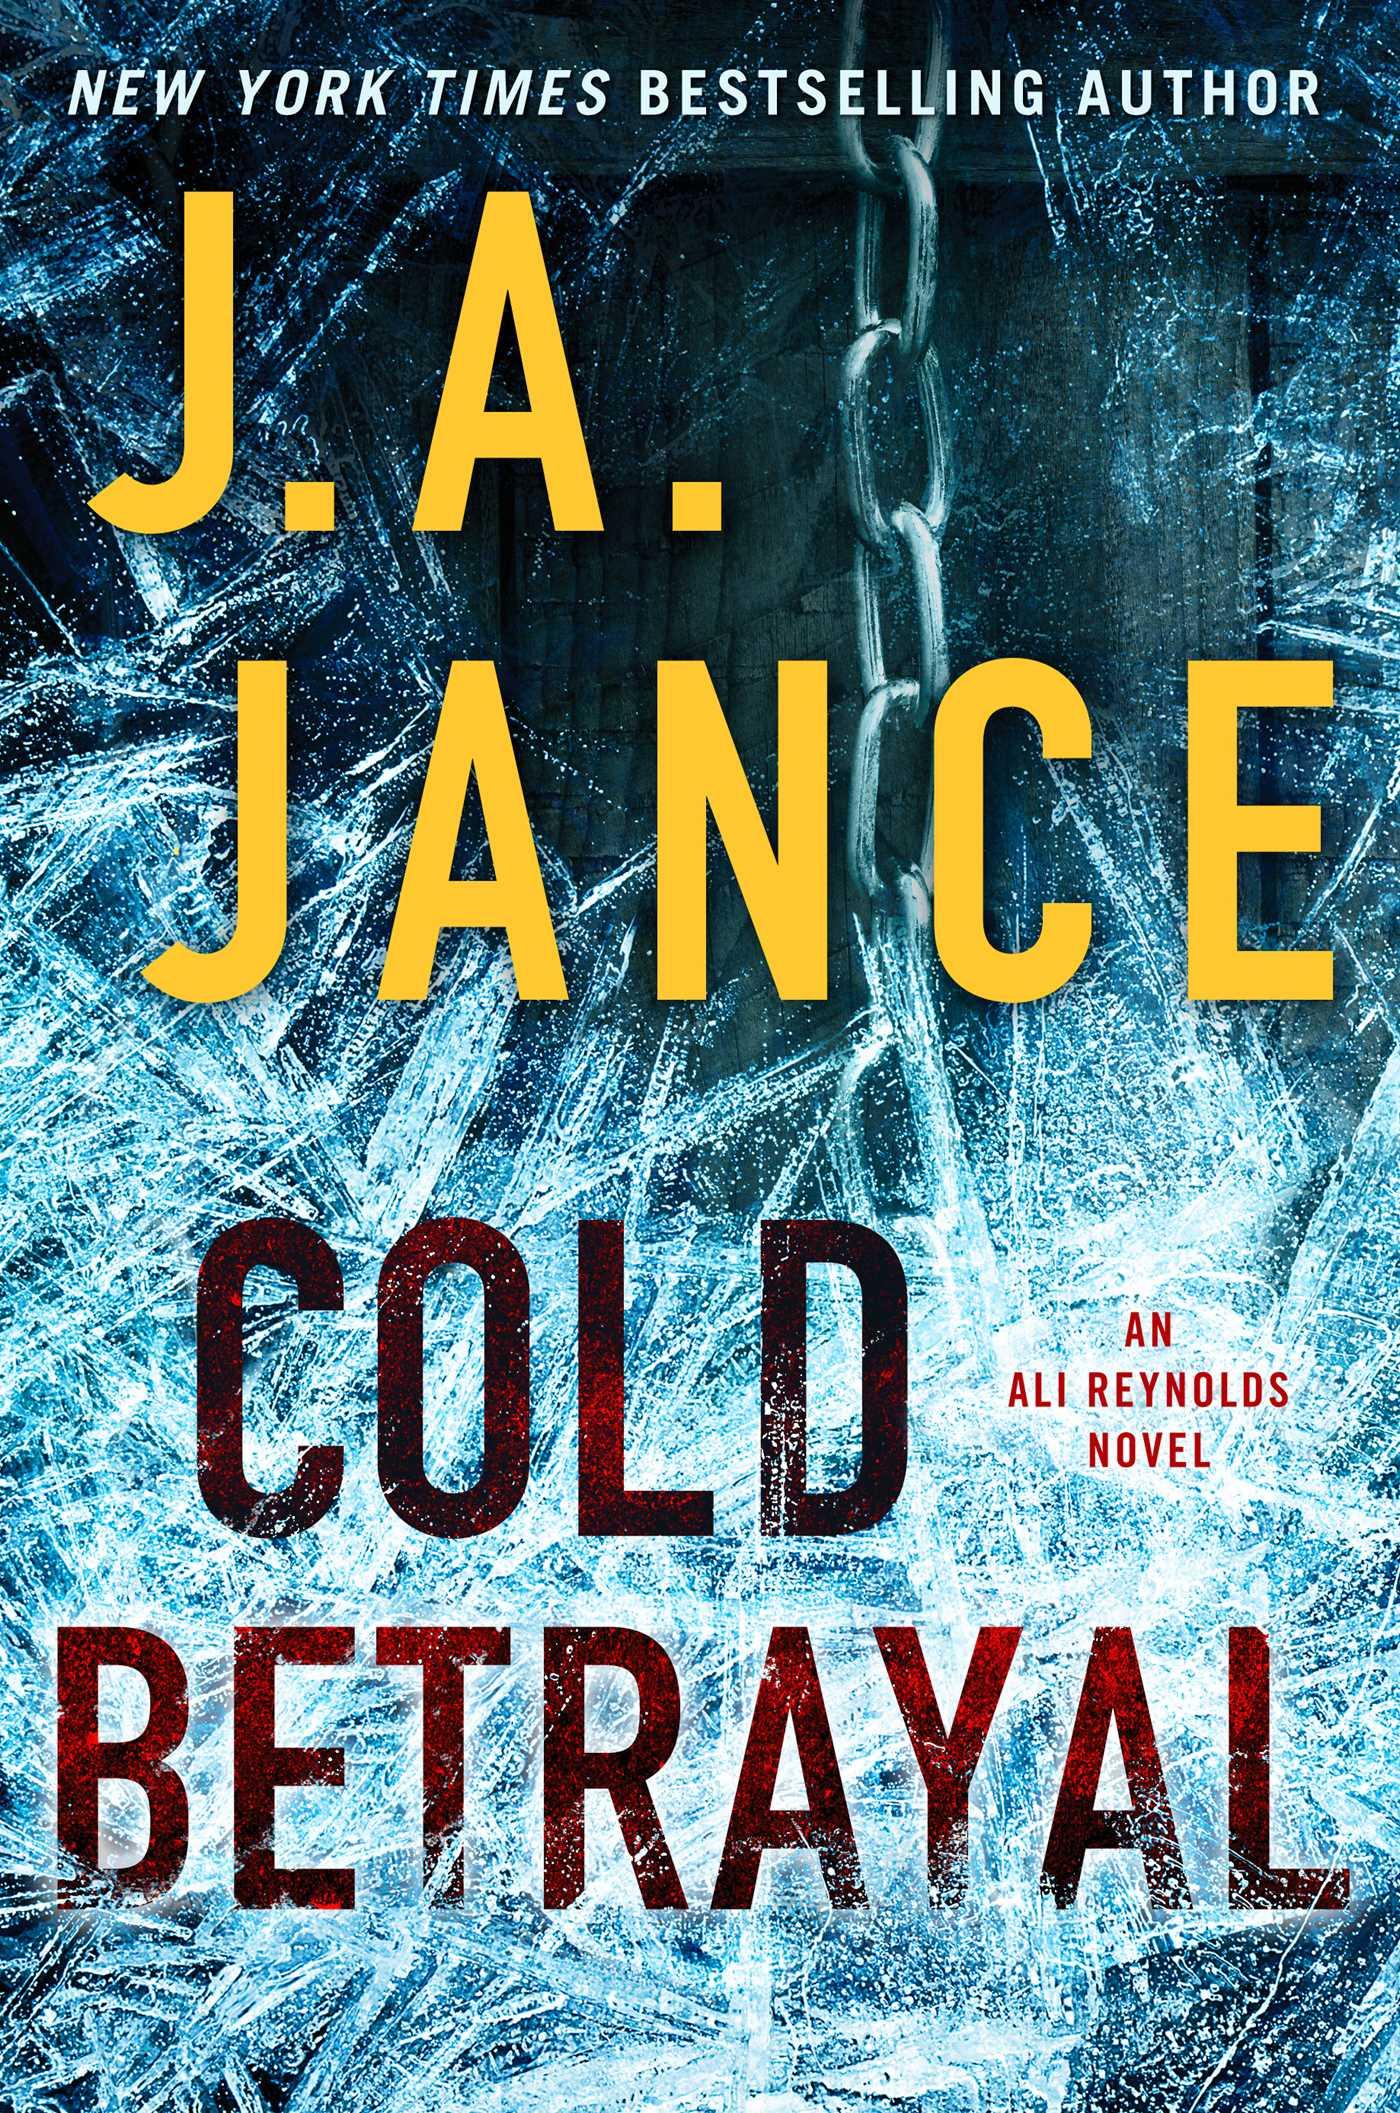 Cold betrayal 9781476745046 hr